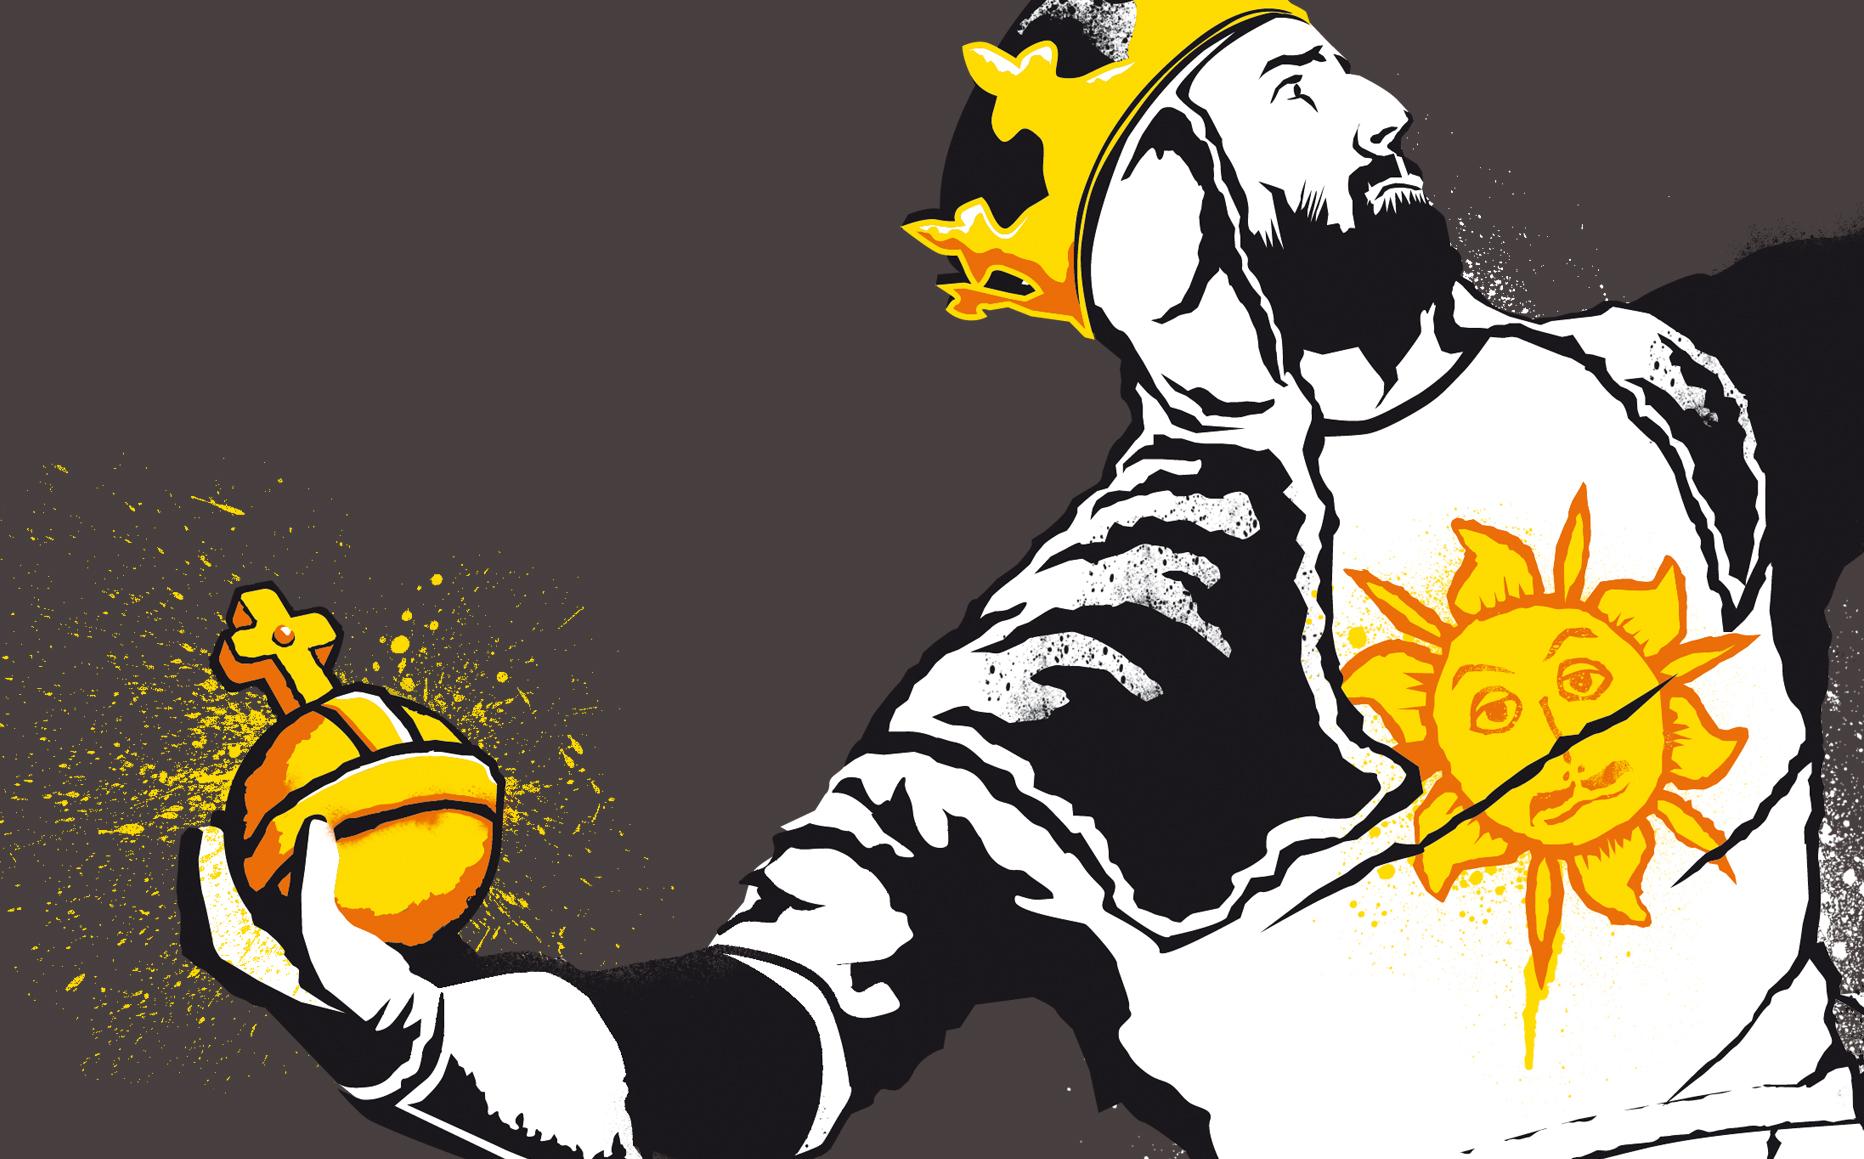 Kgullholmen Illustrations Banksy Python 1 2 5